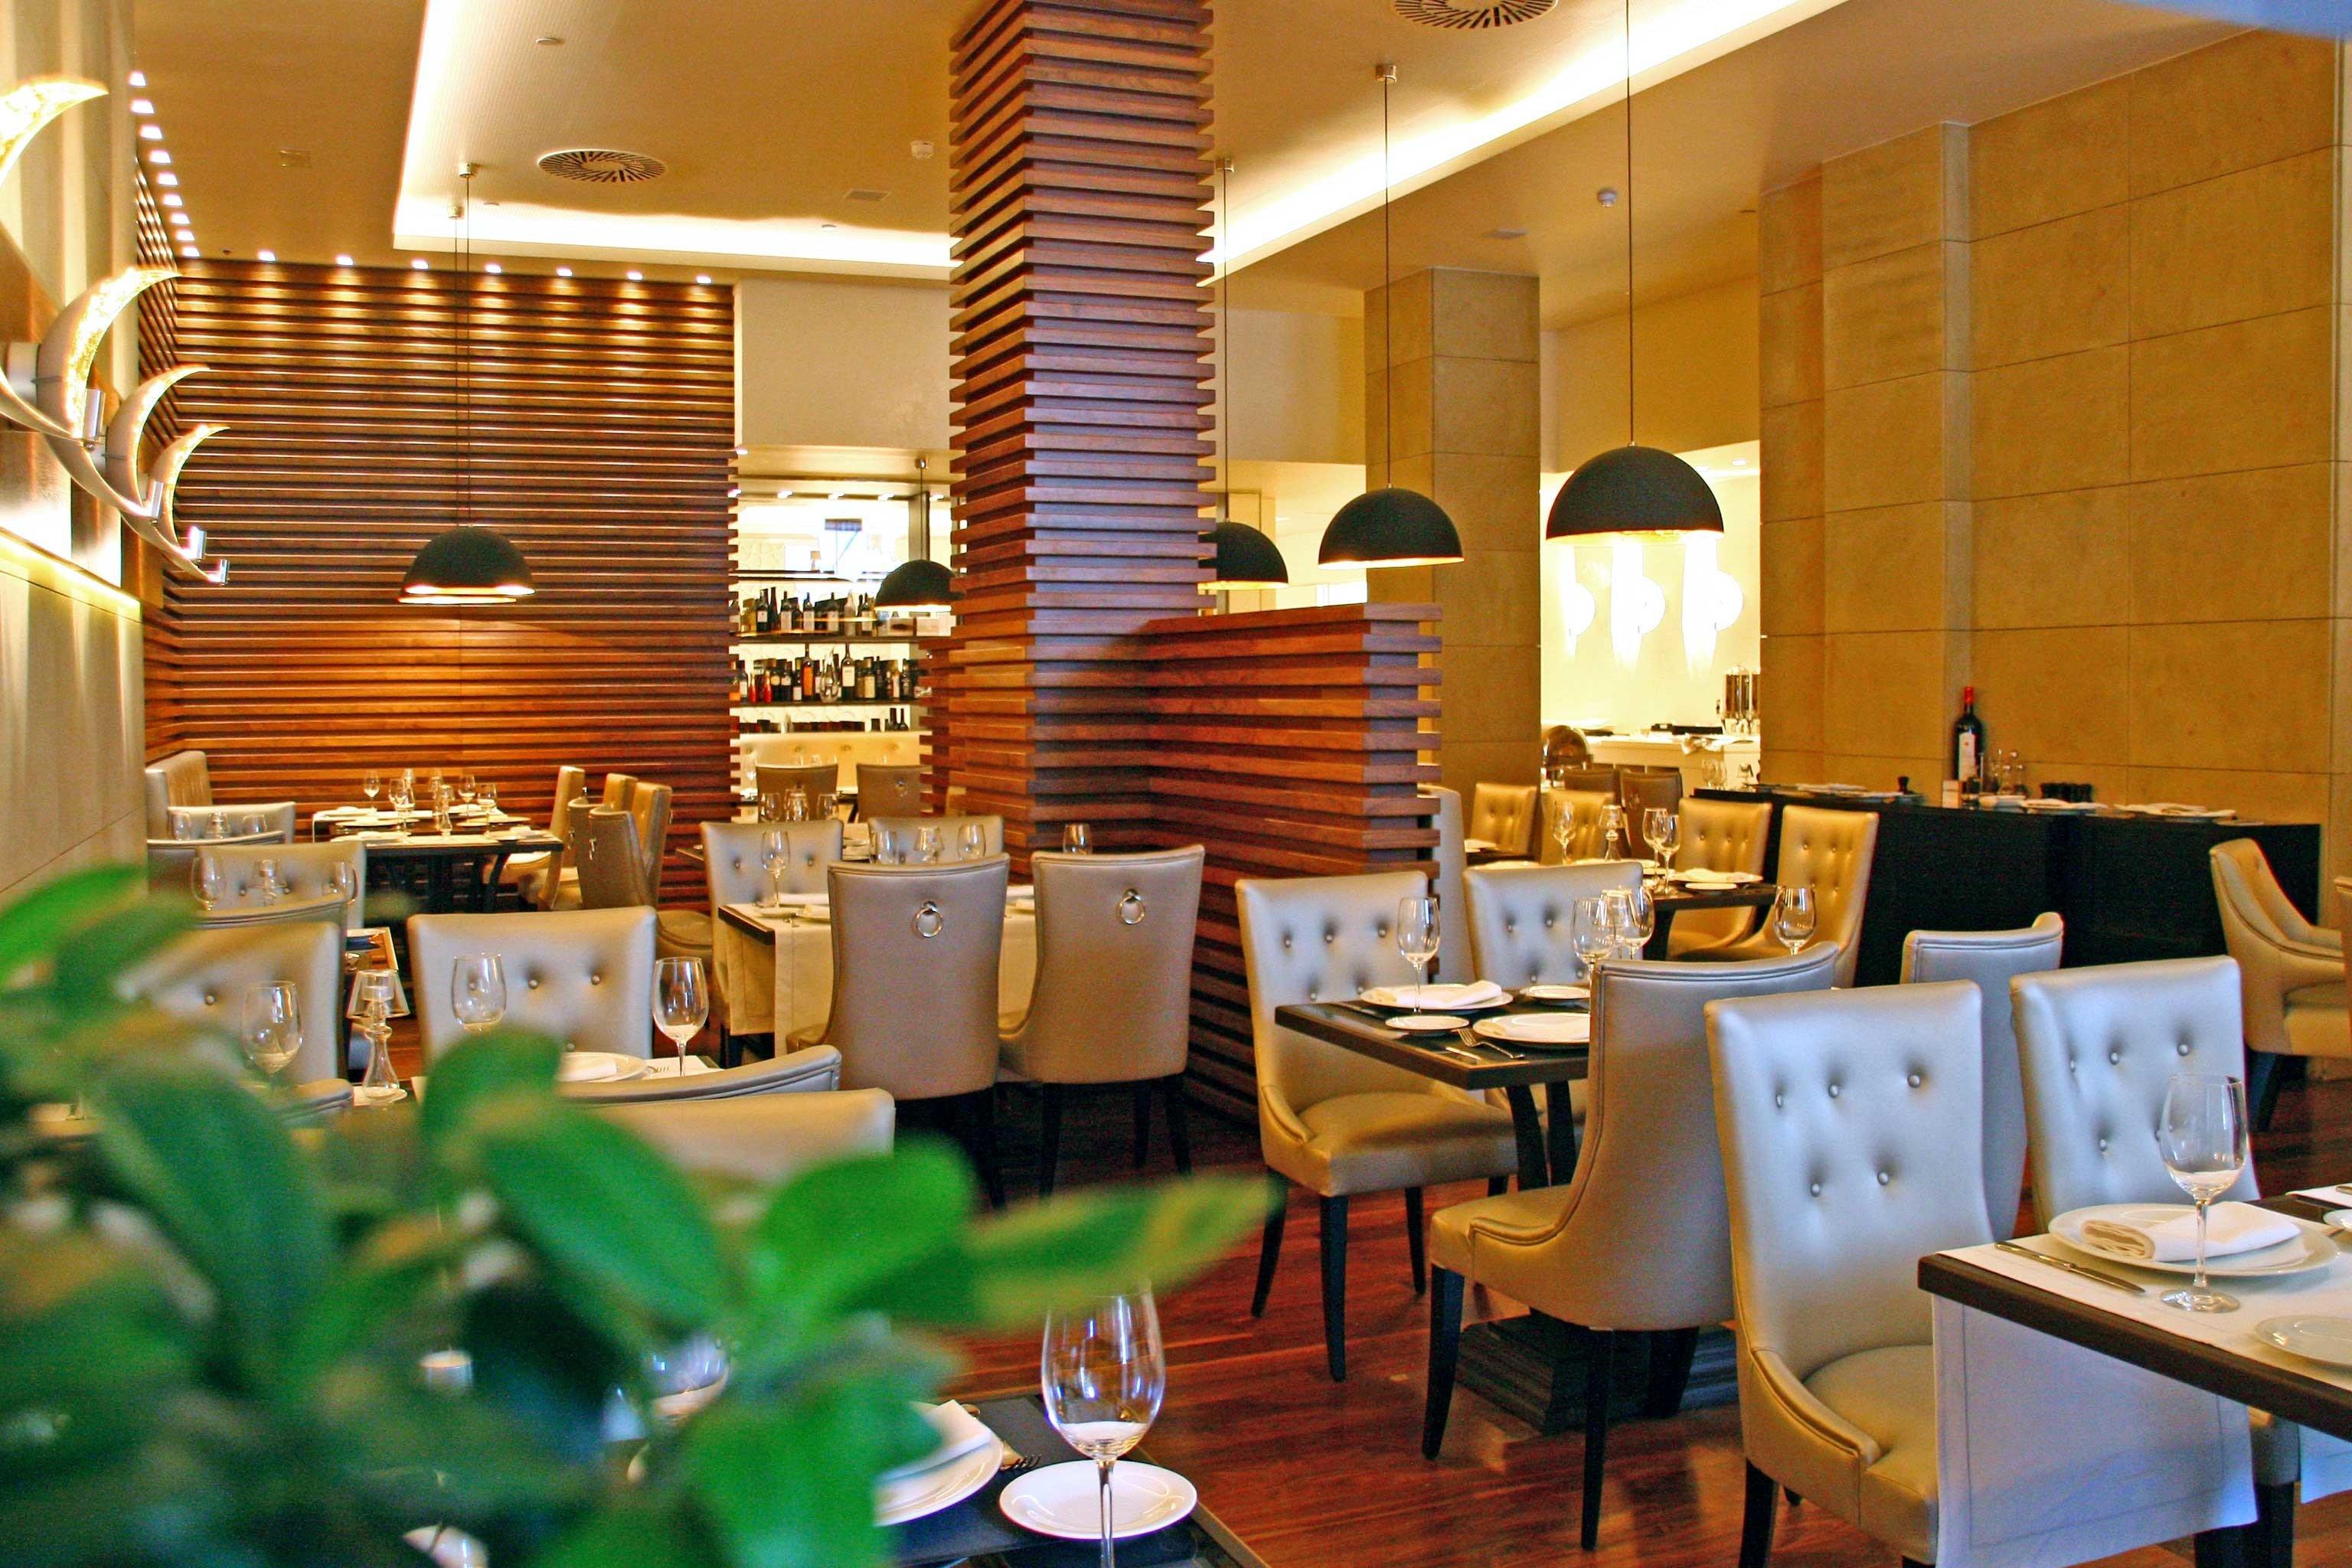 Bar Dining Drink Eat Lounge Luxury restaurant function hall Resort café dining table